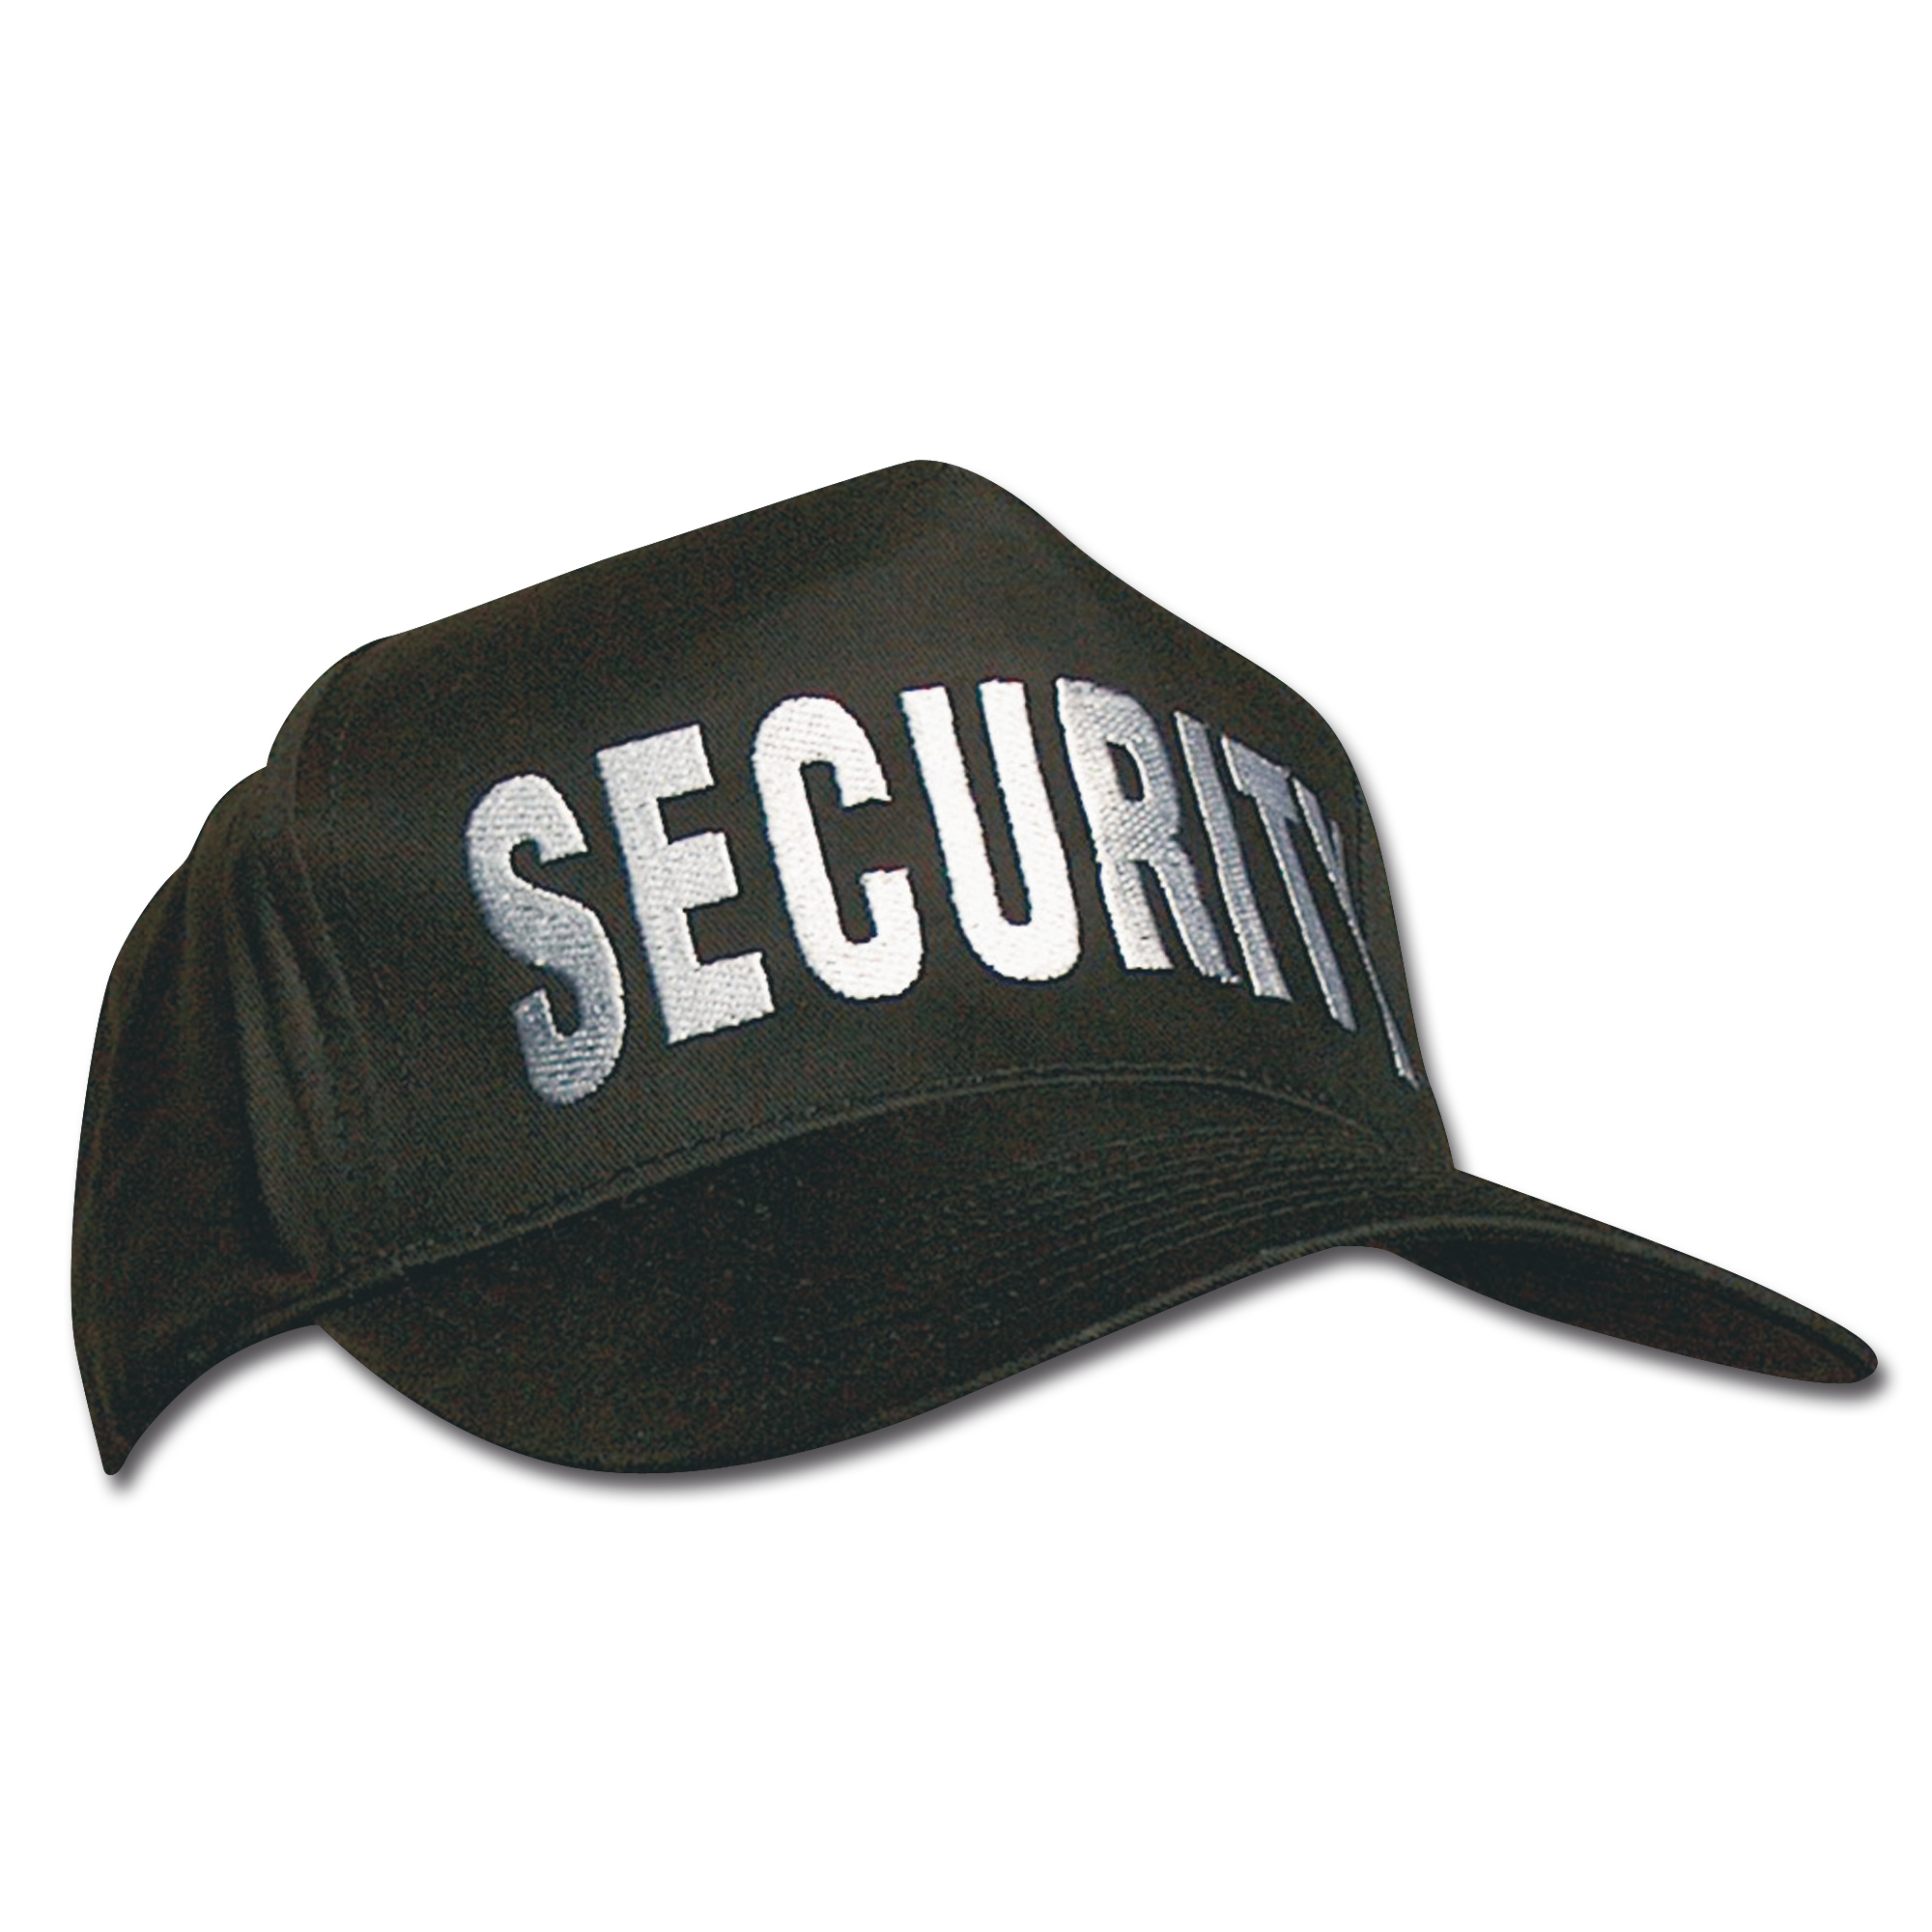 Baseball Cap SECURITY schwarz